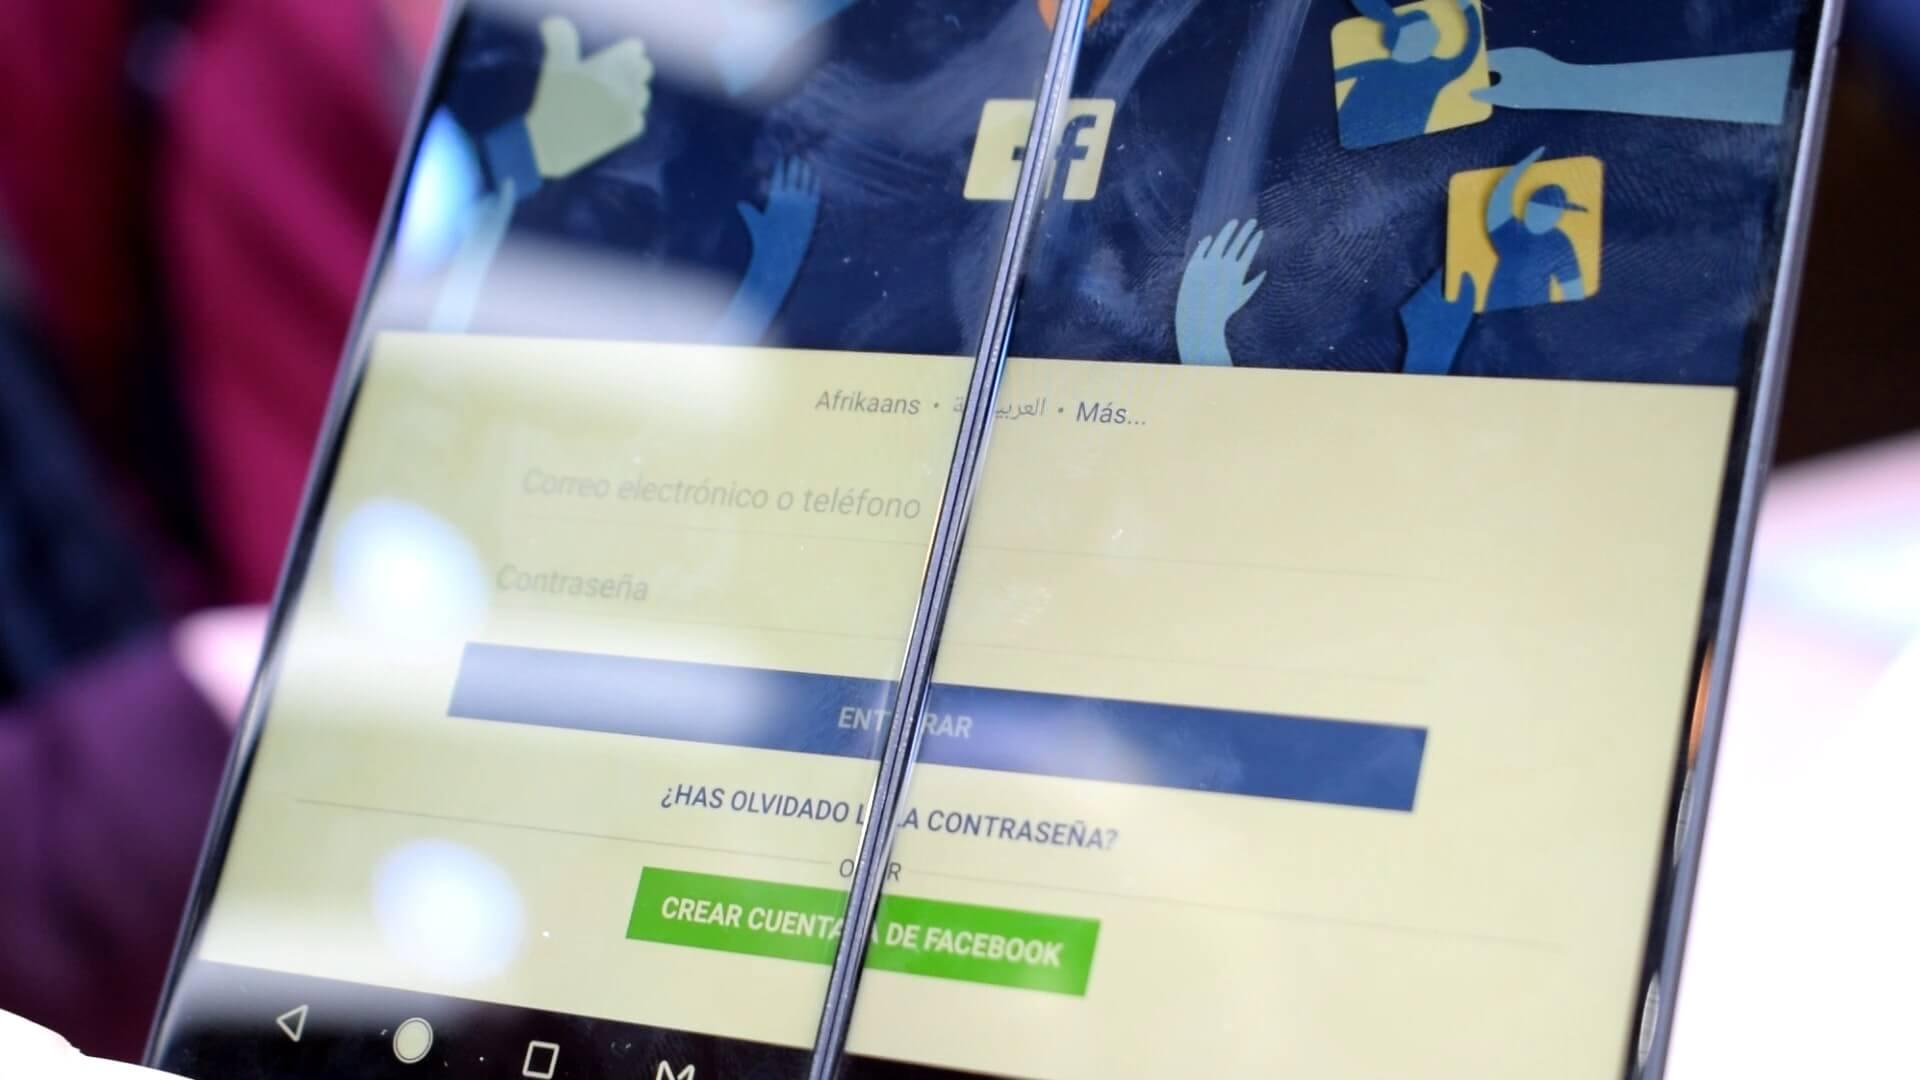 móvil de dos pantallas